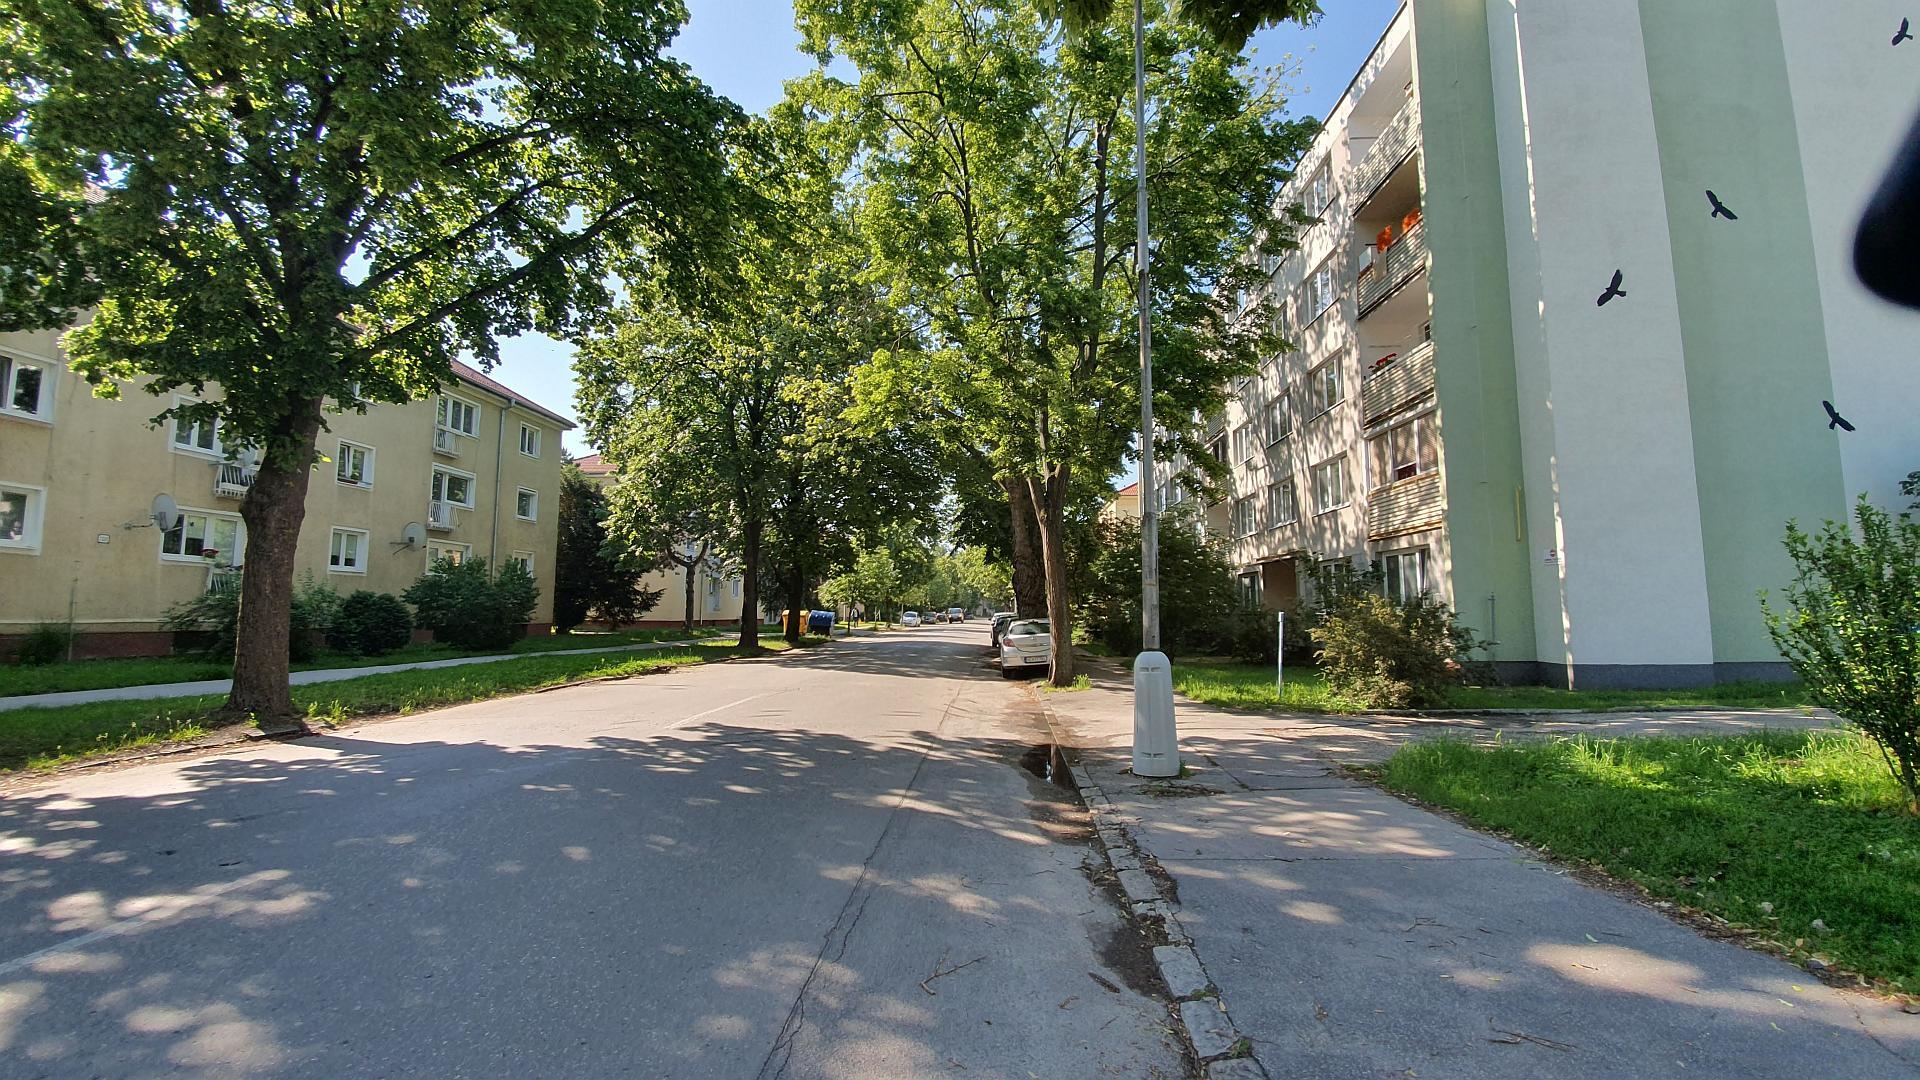 Kúpa a následný prenájom dvojizbového bytu len 200 m od mestského parku